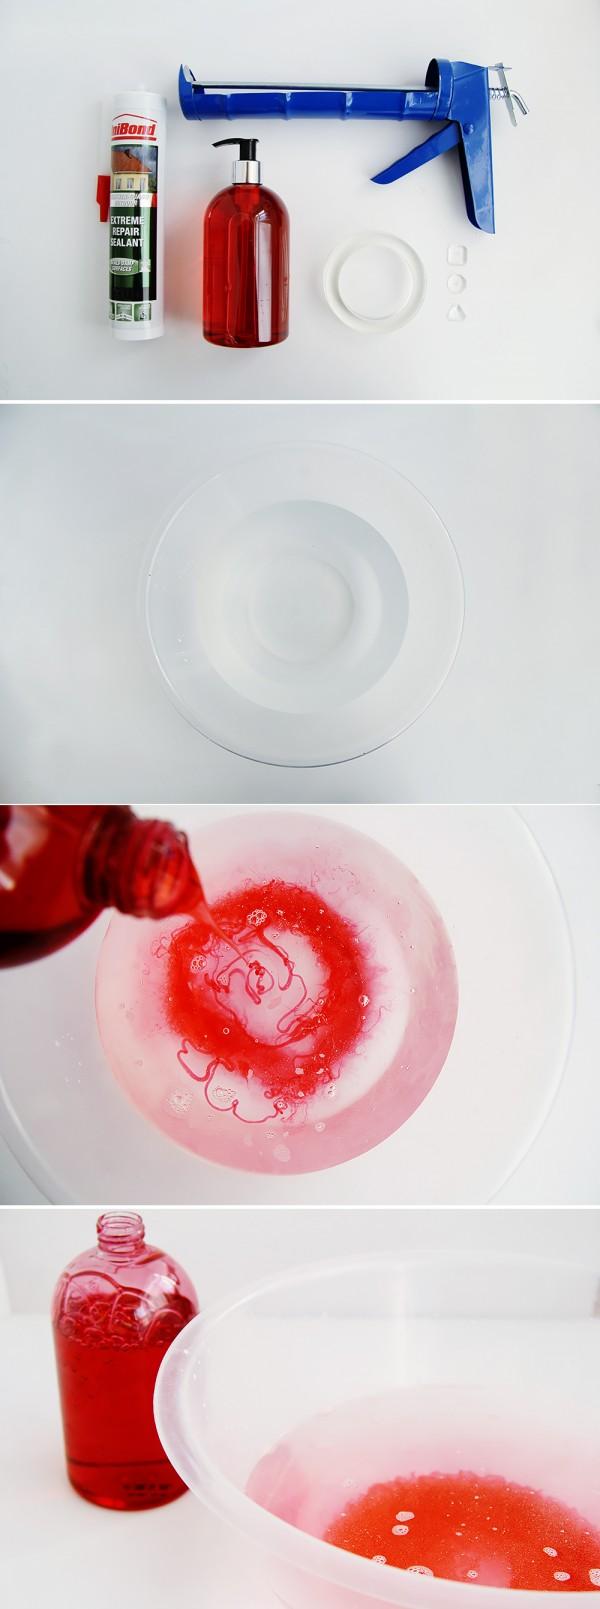 Quimica alimentaci n y medio ambiente chemistry food for Pataka bano food mat